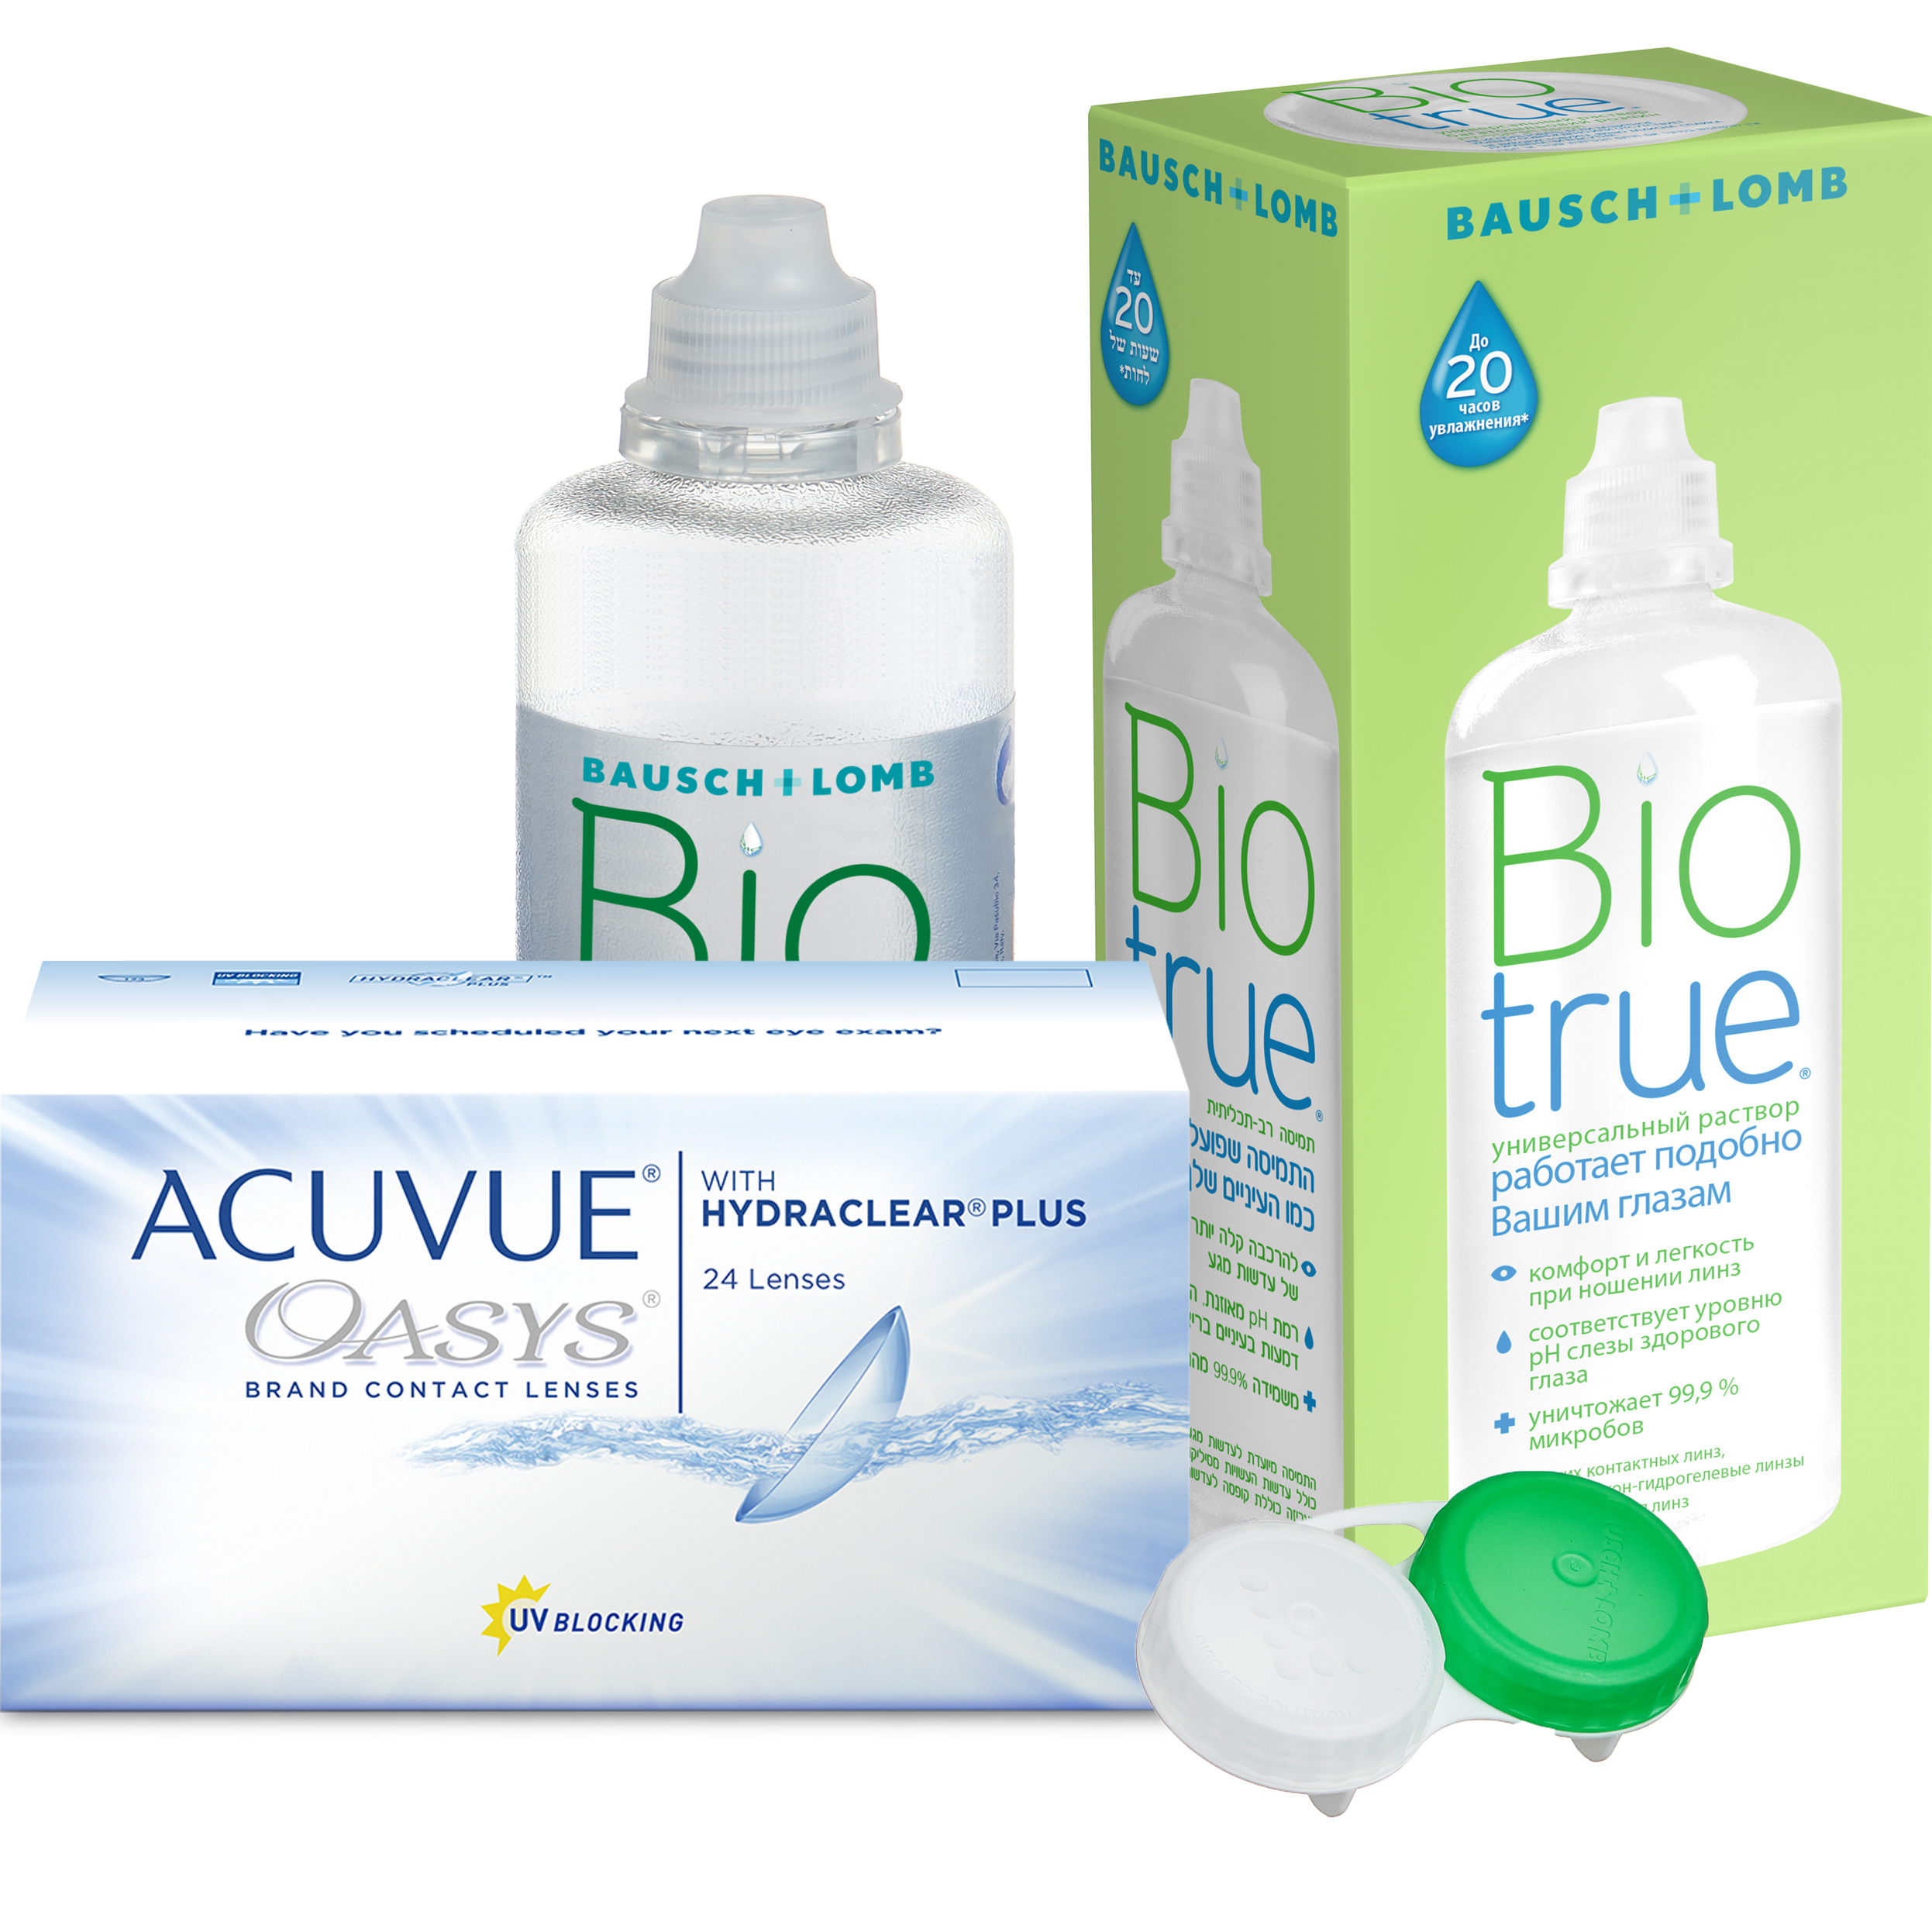 Купить Oasys with Hydraclear Plus 24 линзы + Biotrue, Контактные линзы Acuvue Oasys with Hydraclear Plus 24 линзы R 8.4 +2, 00 + Biotrue 300 мл